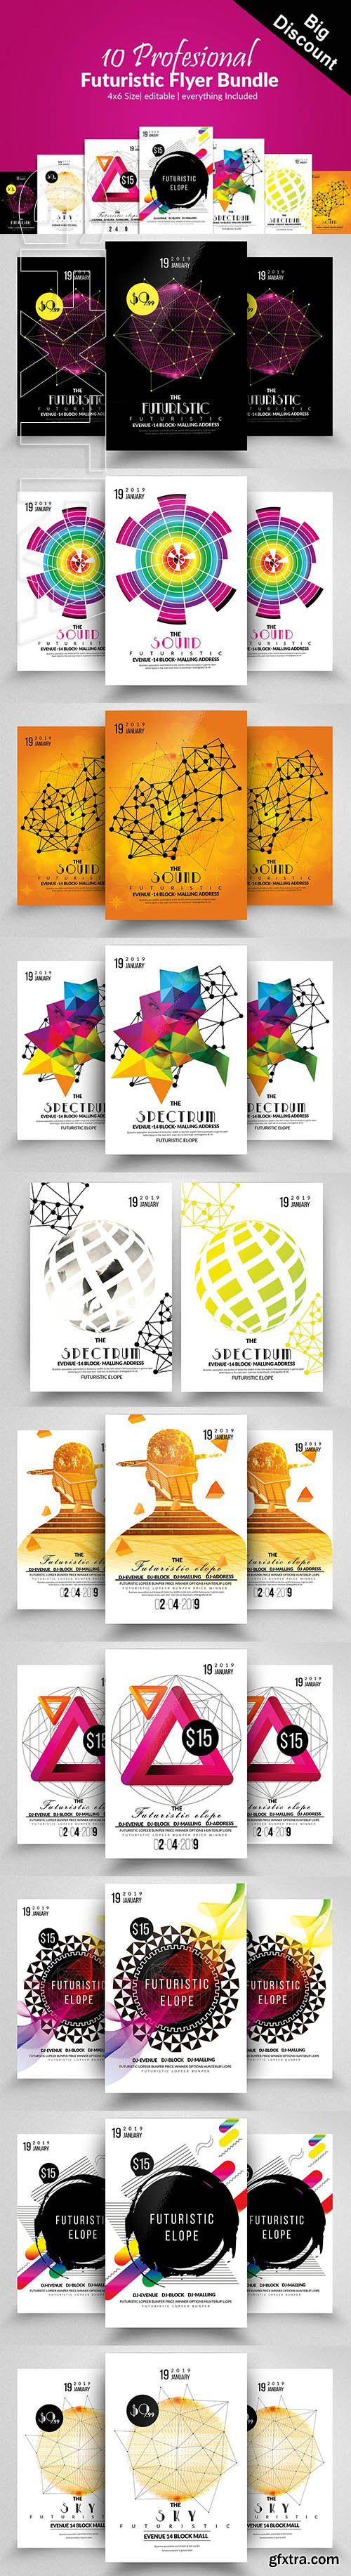 CreativeMarket - 10 Futuristic Electro Flyer Bundle 2683763